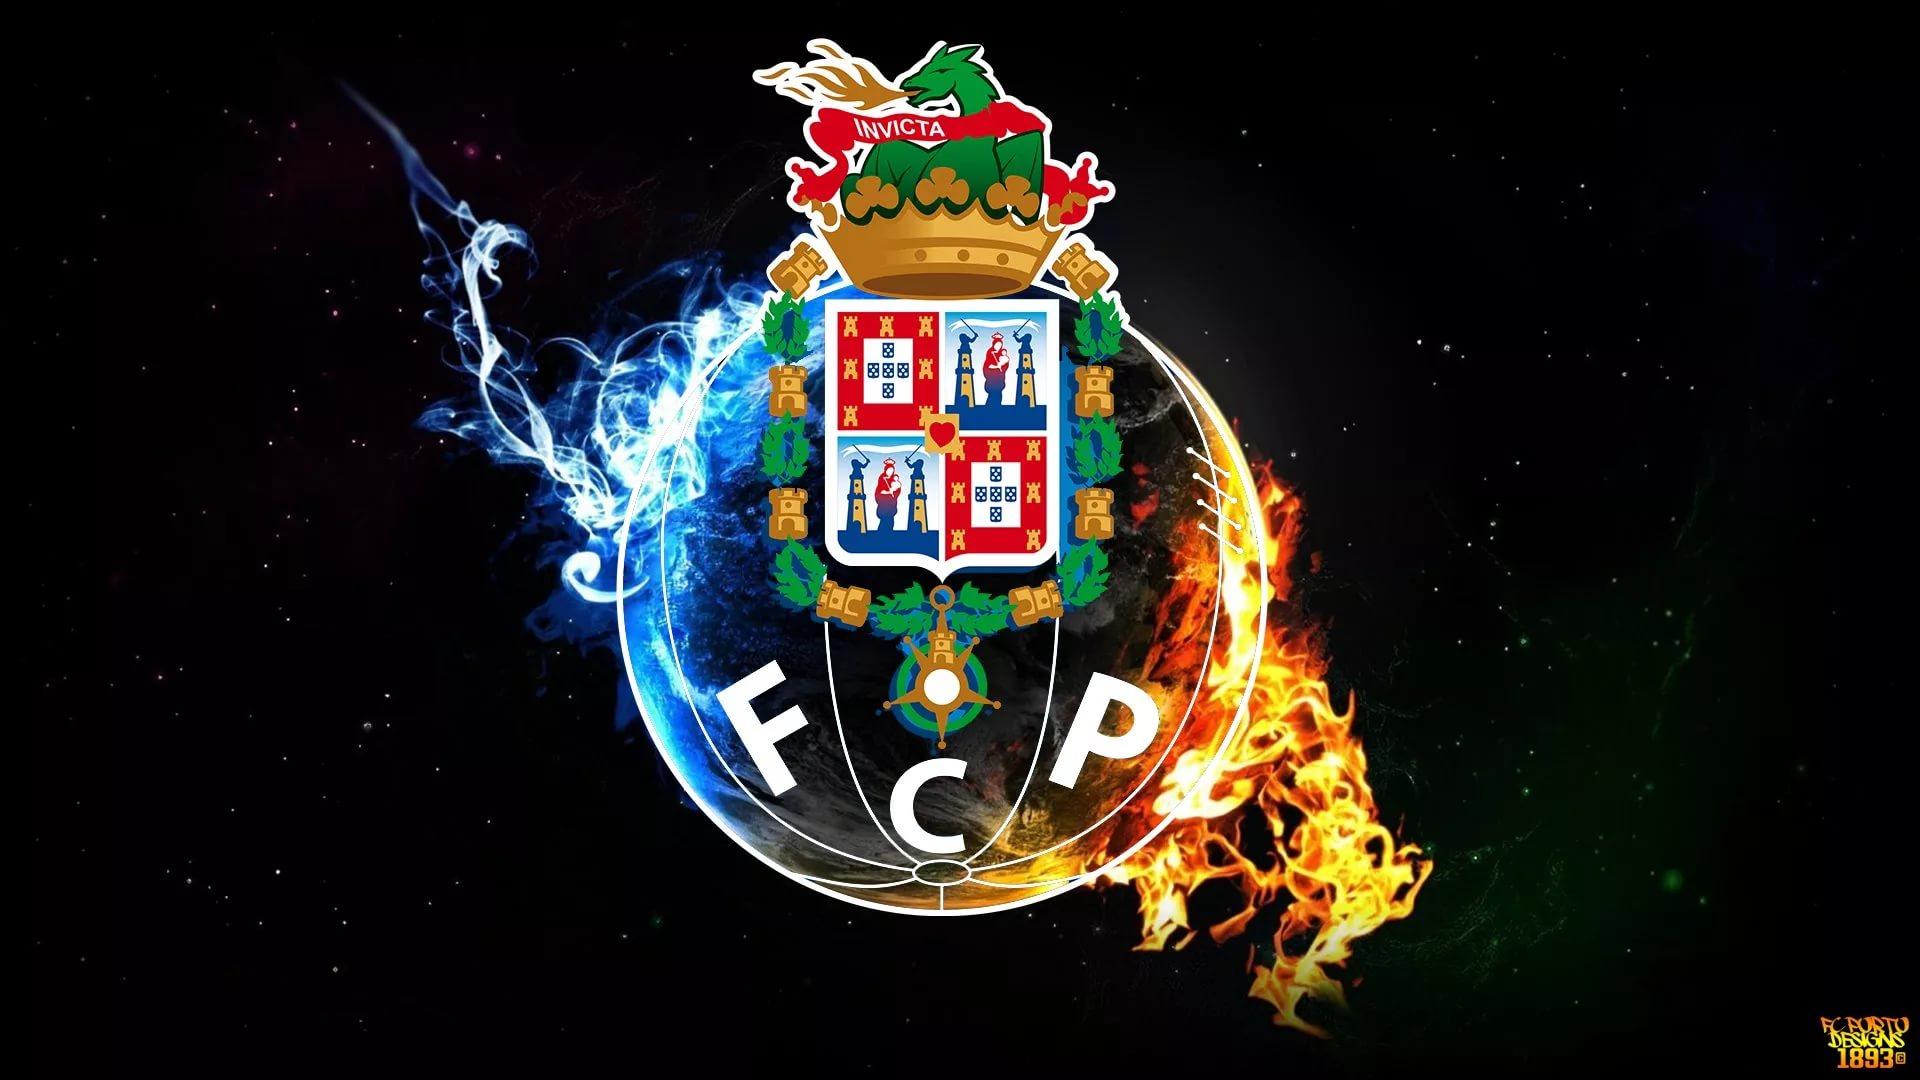 FC Porto Wallpaper 13   1920 X 1080 stmednet 1920x1080